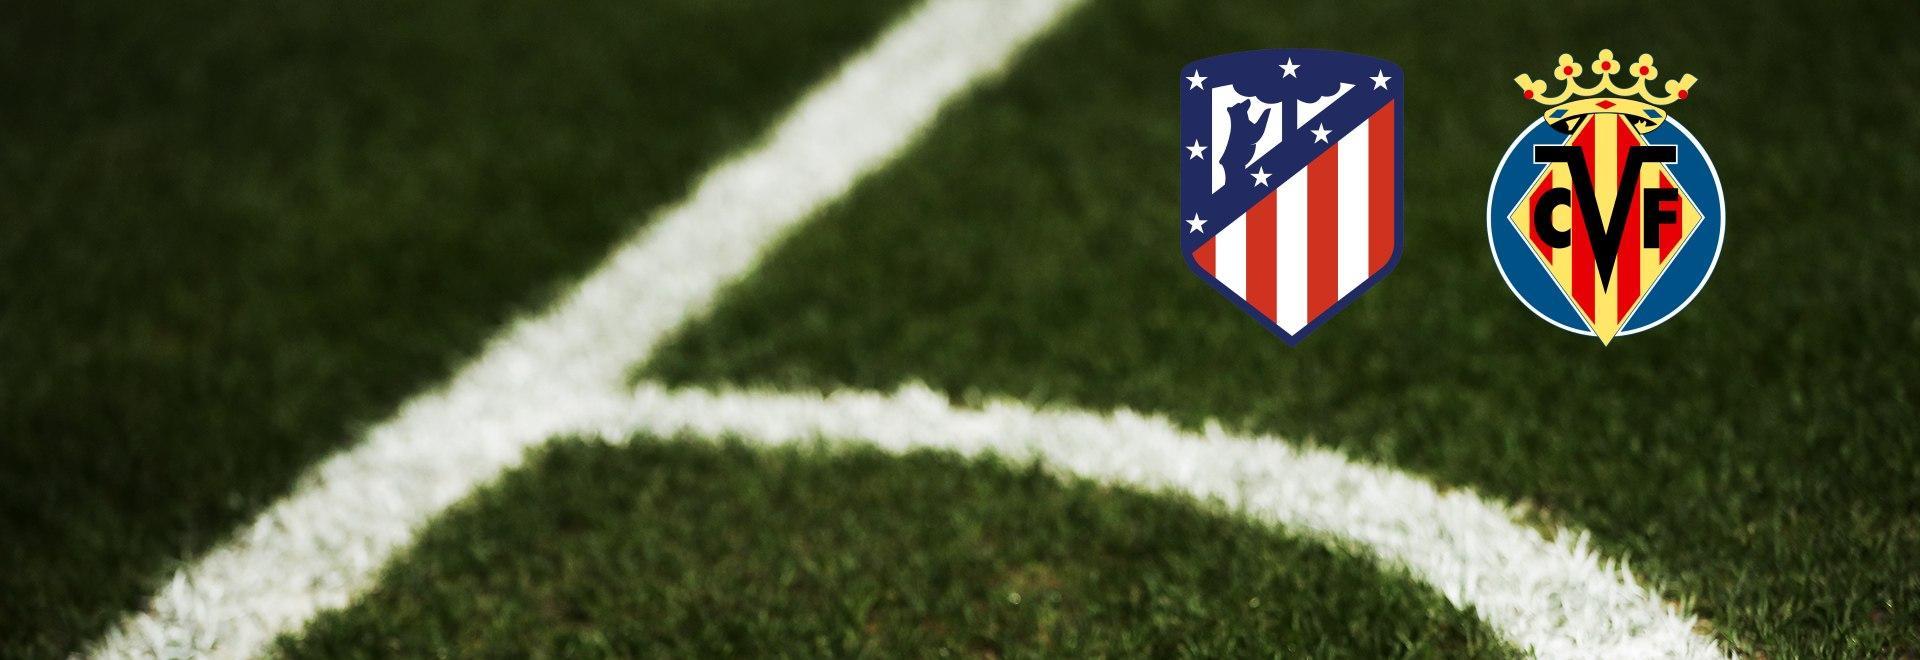 Atletico M. - Villarreal. 25a g.